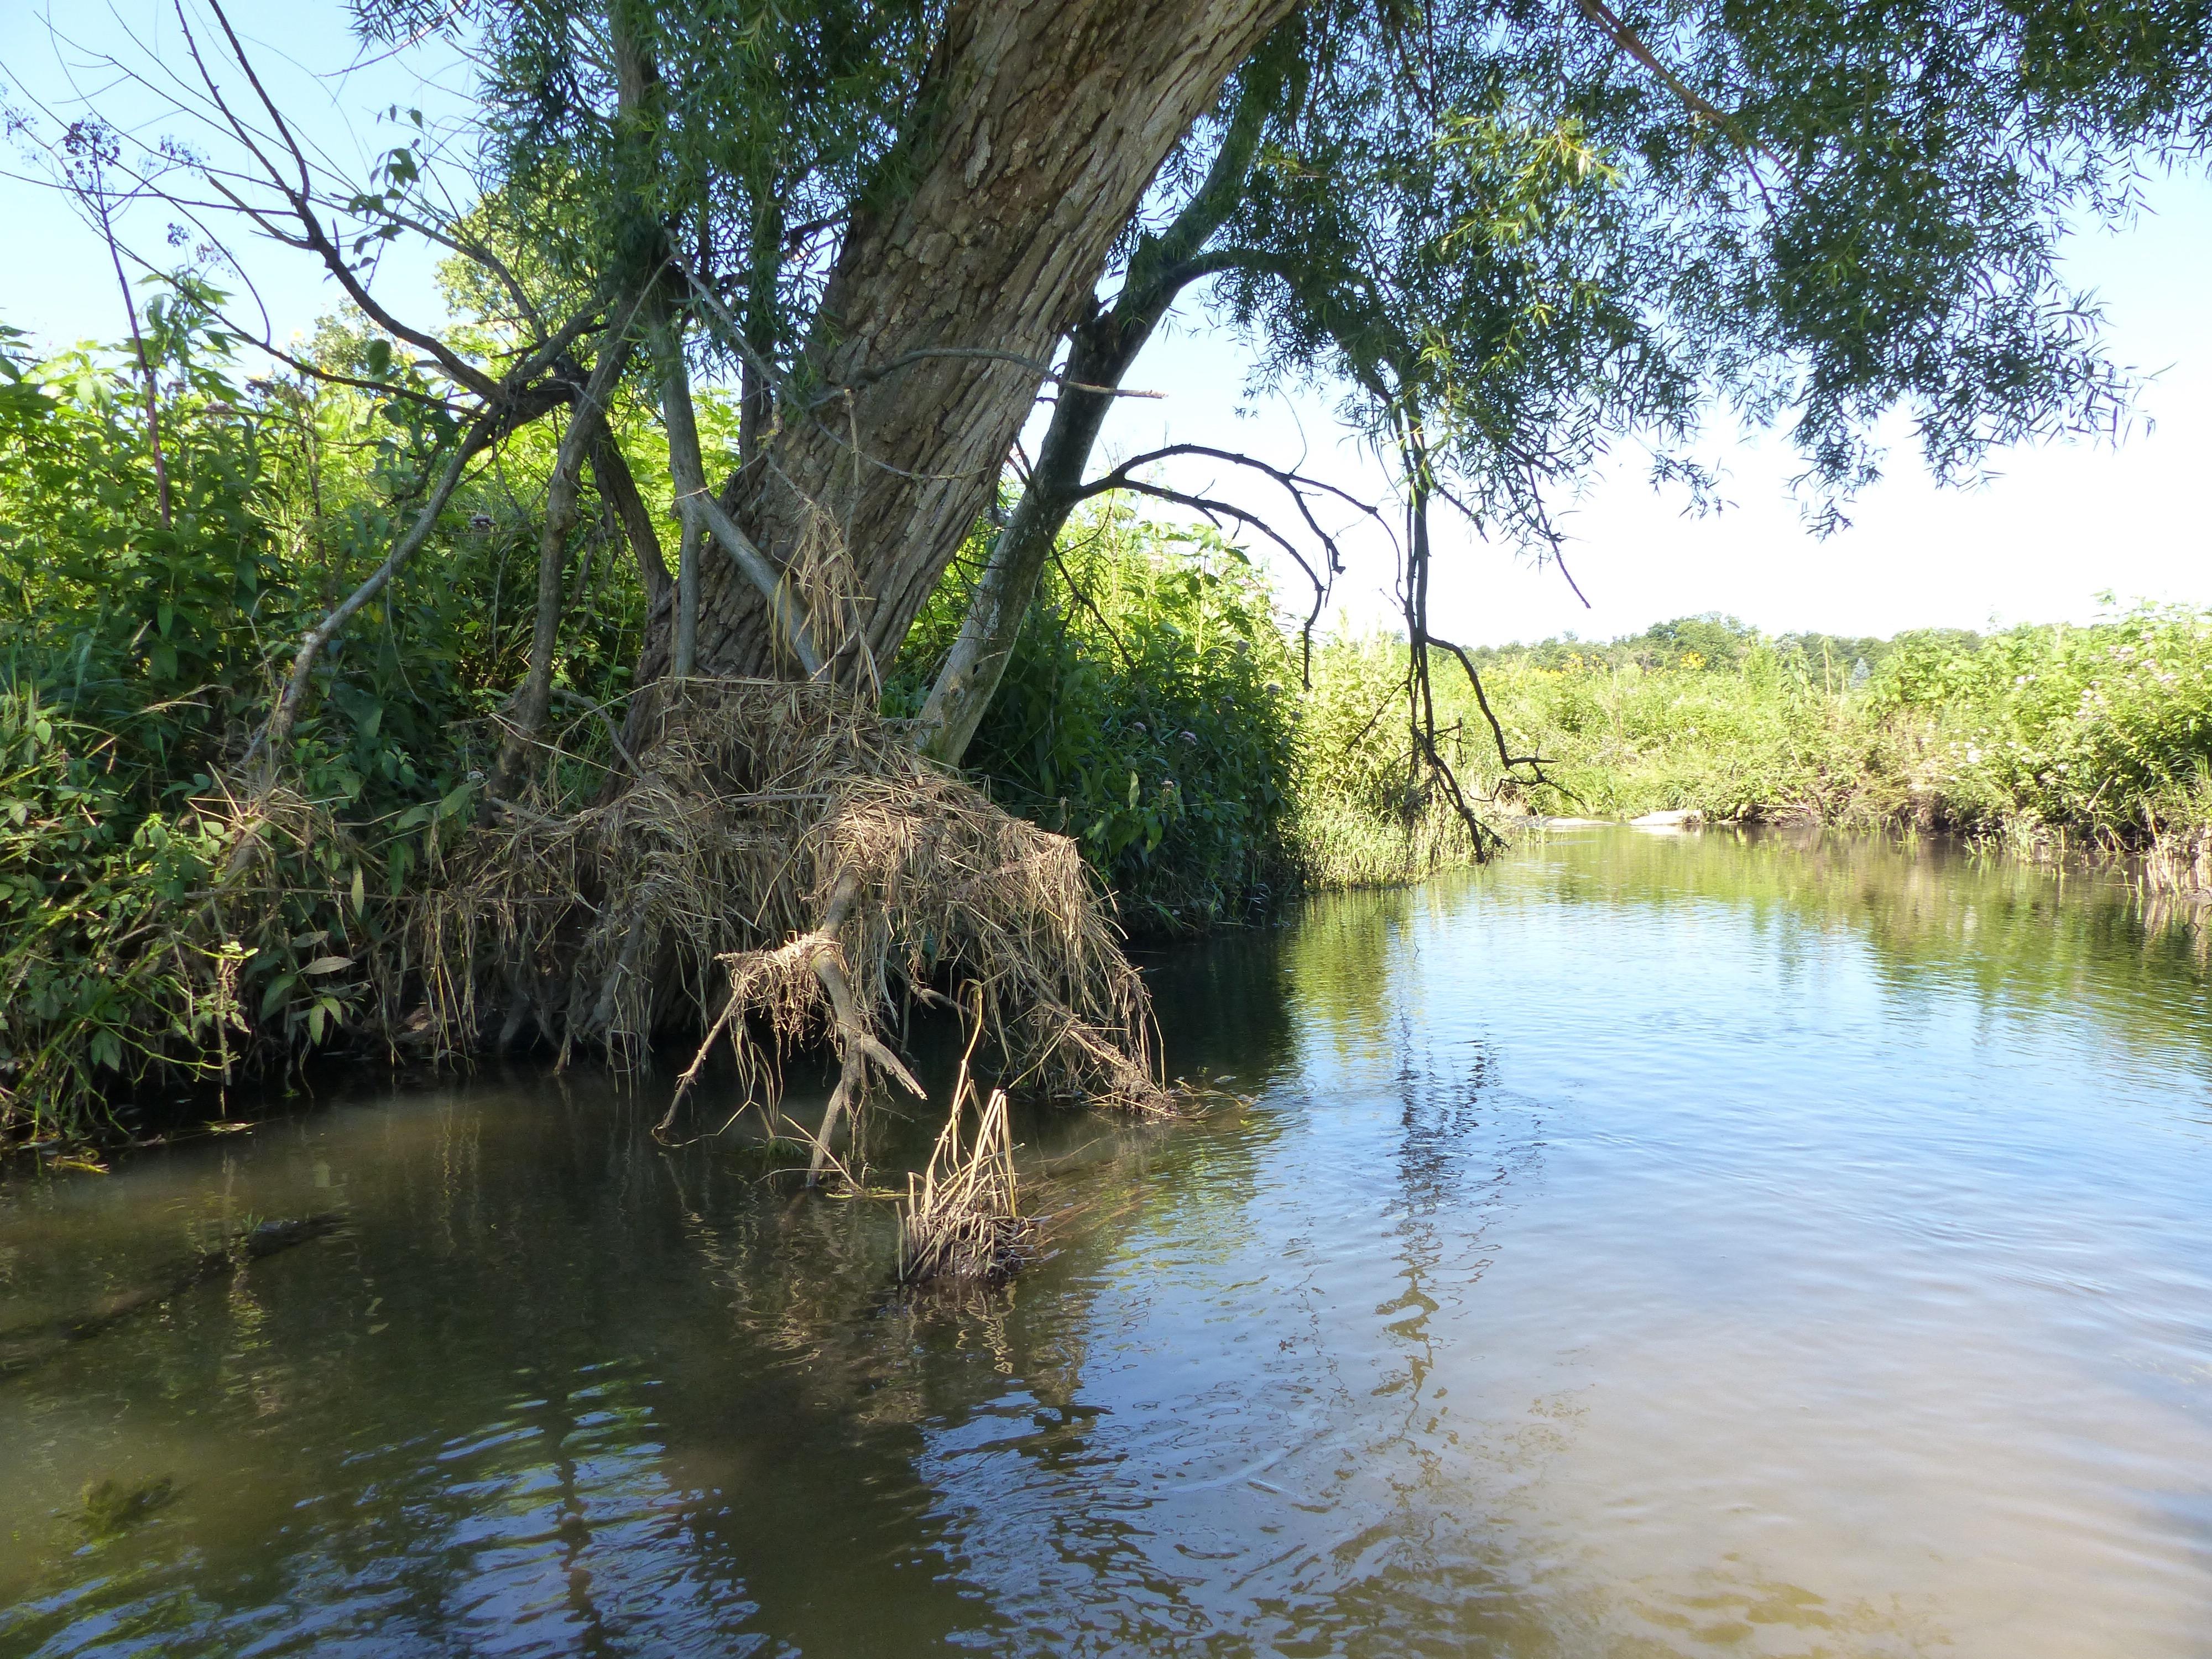 Clear Creek Nachusa Grasslands 7:17.jpg